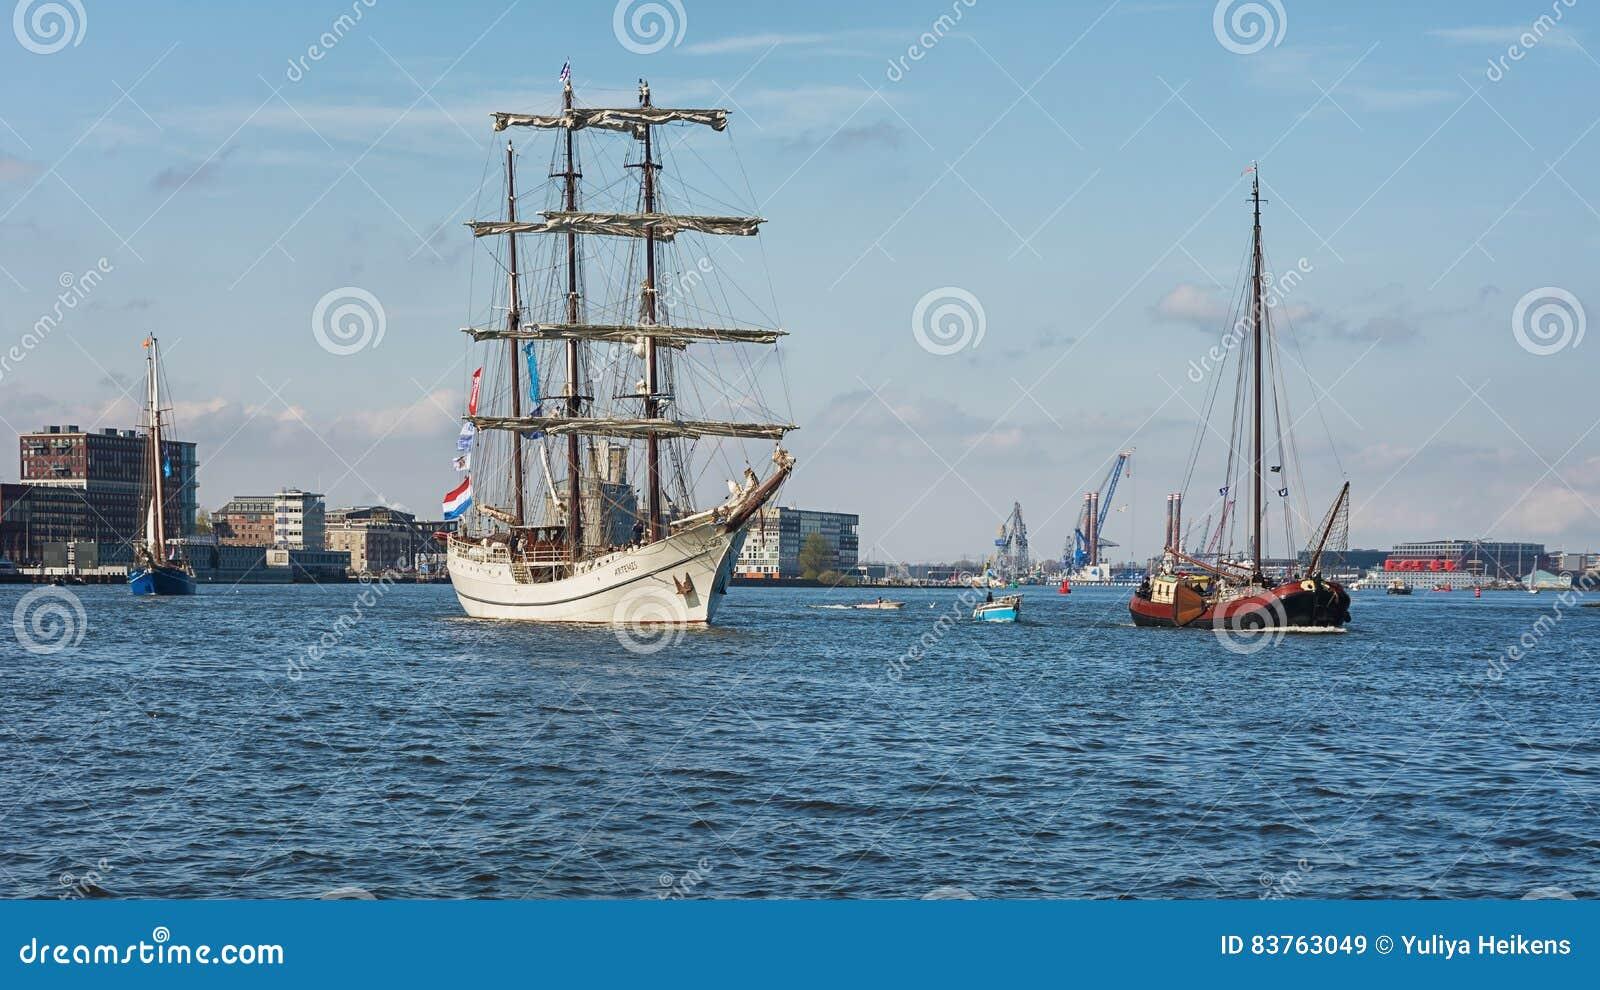 Shipping On The Ij Near Amsterdam - George Laurens Kiers